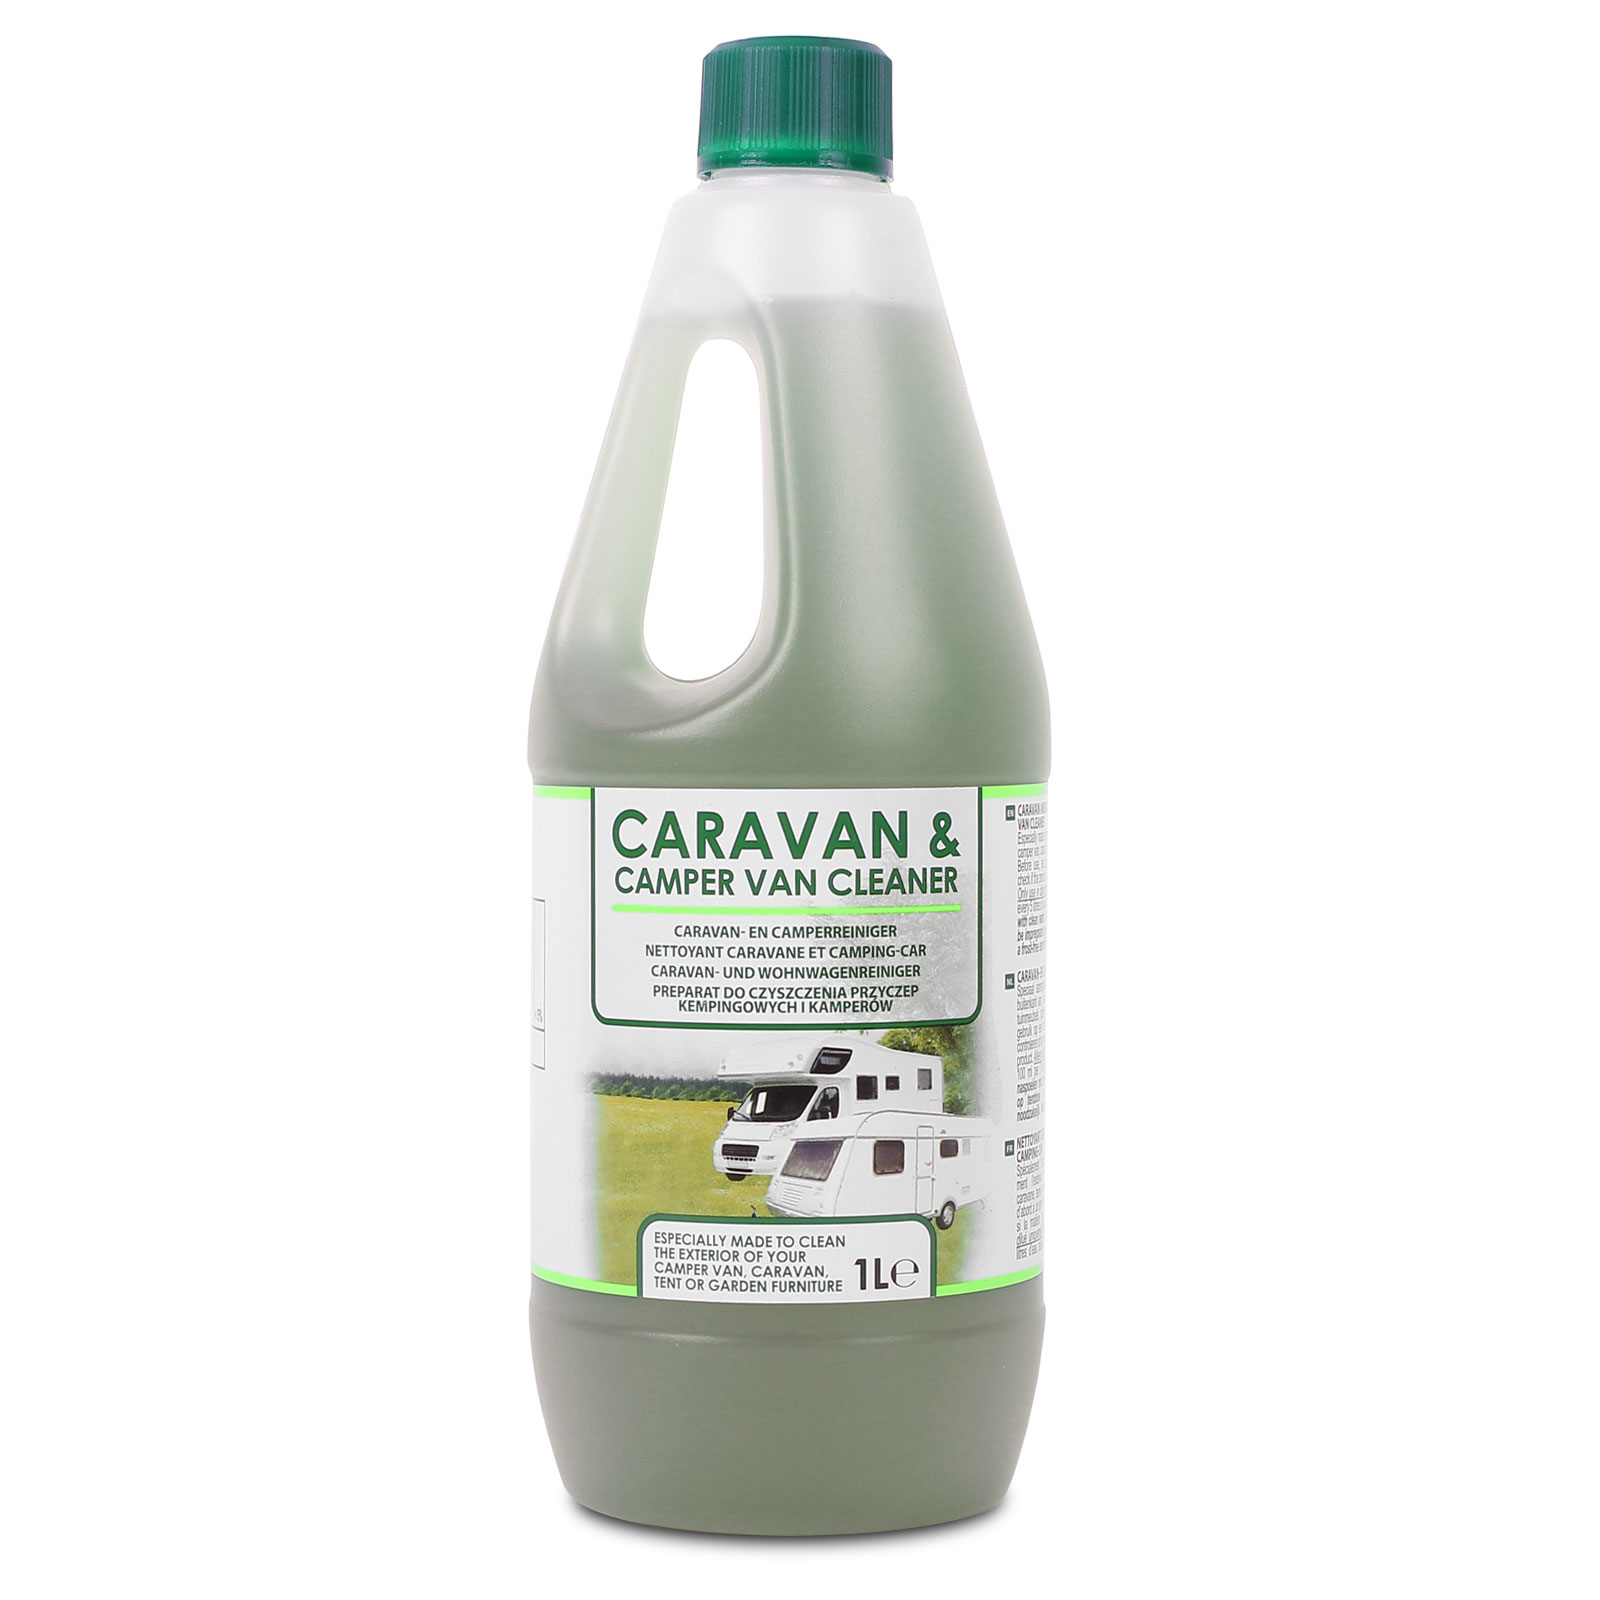 Caravan Reiniger Konzentrat 1:50 speziell